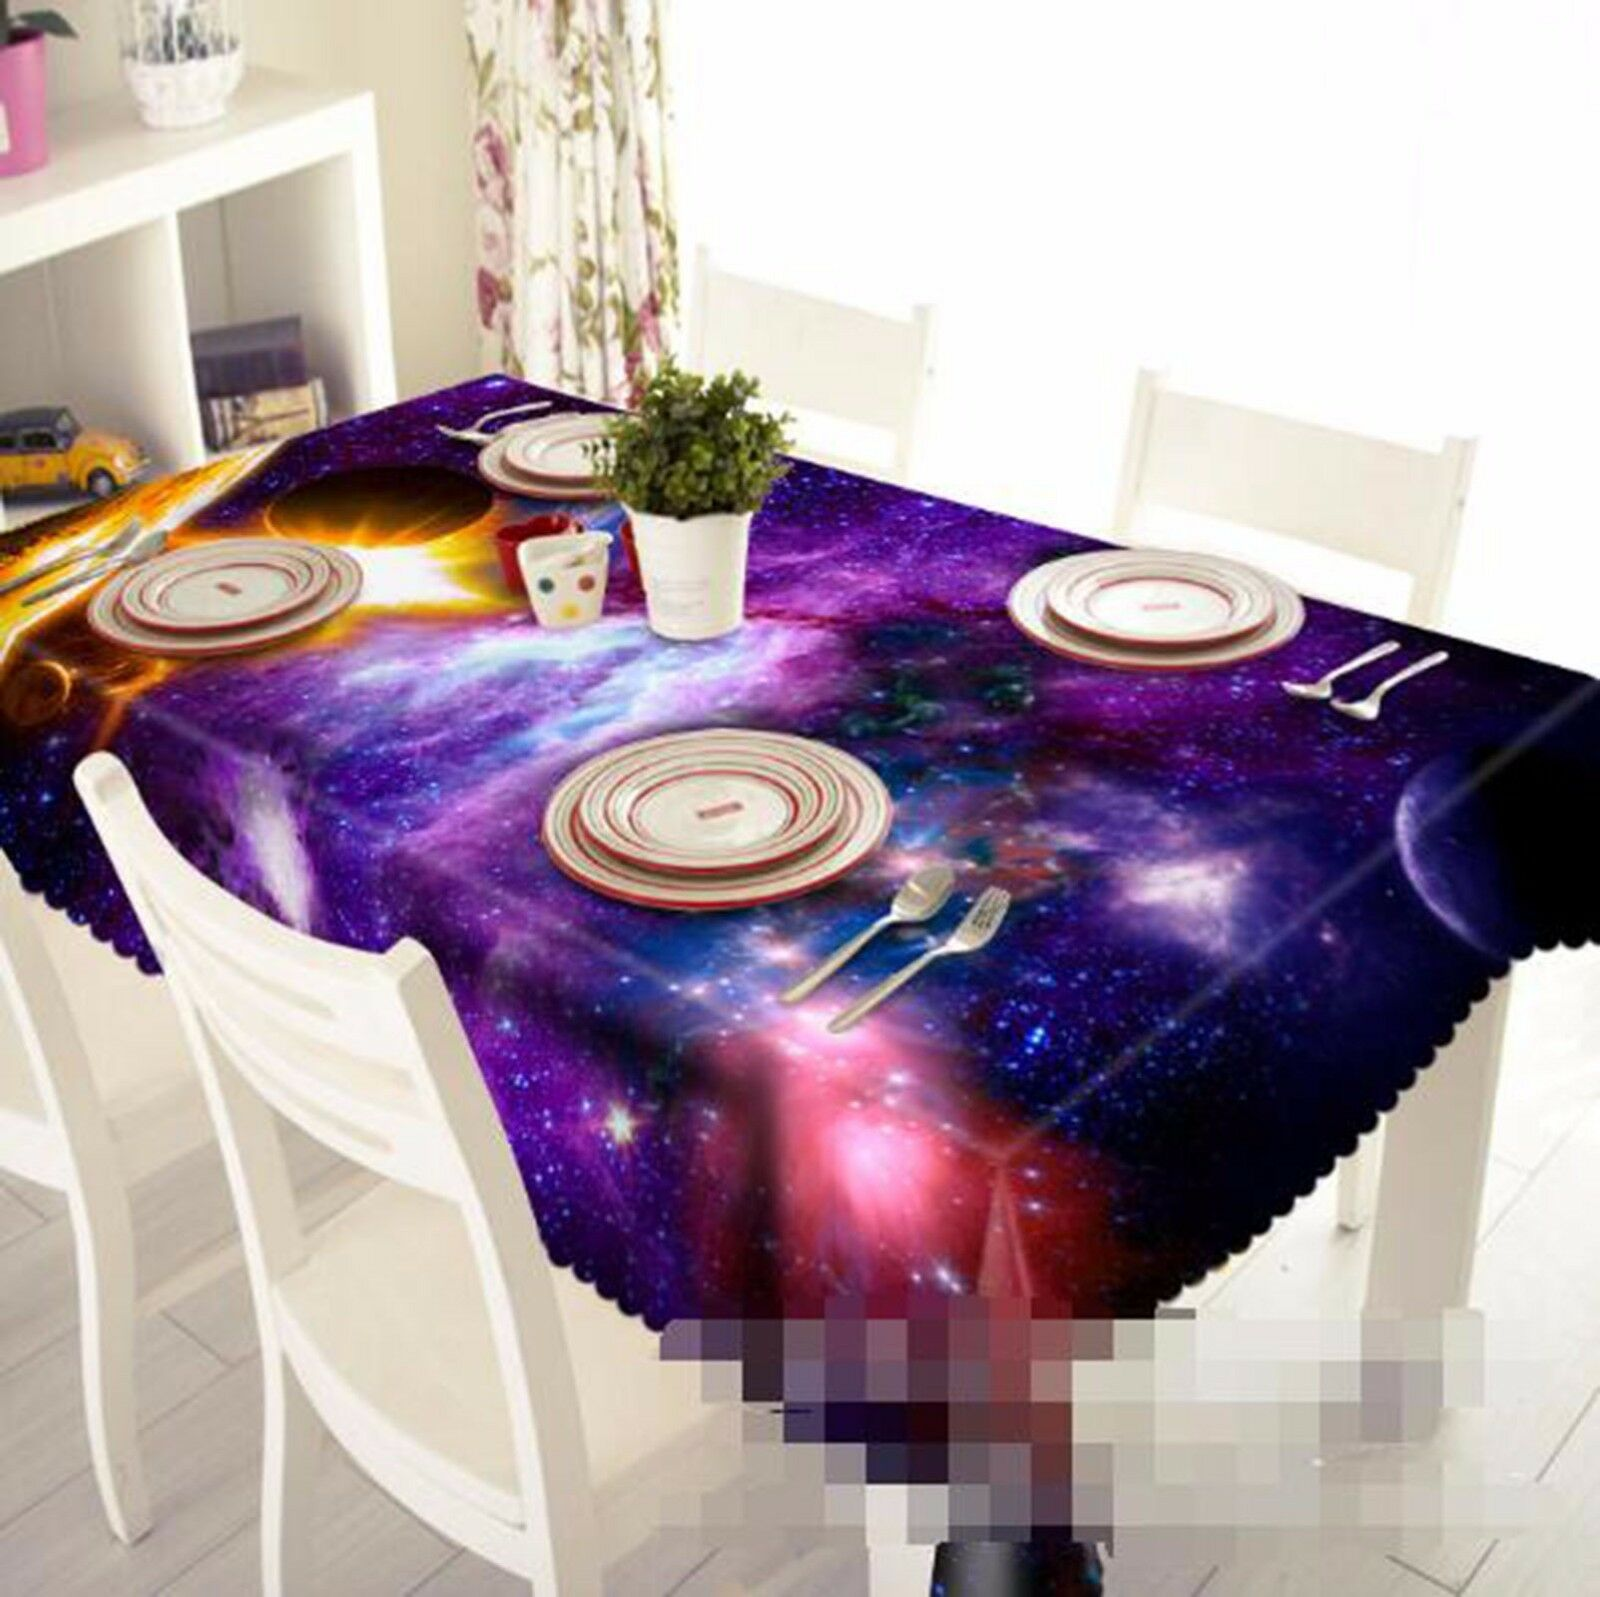 3D espacio Mantel Mantel Paño Cumpleaños Fiesta AJ Wallpaper Reino Unido Limón